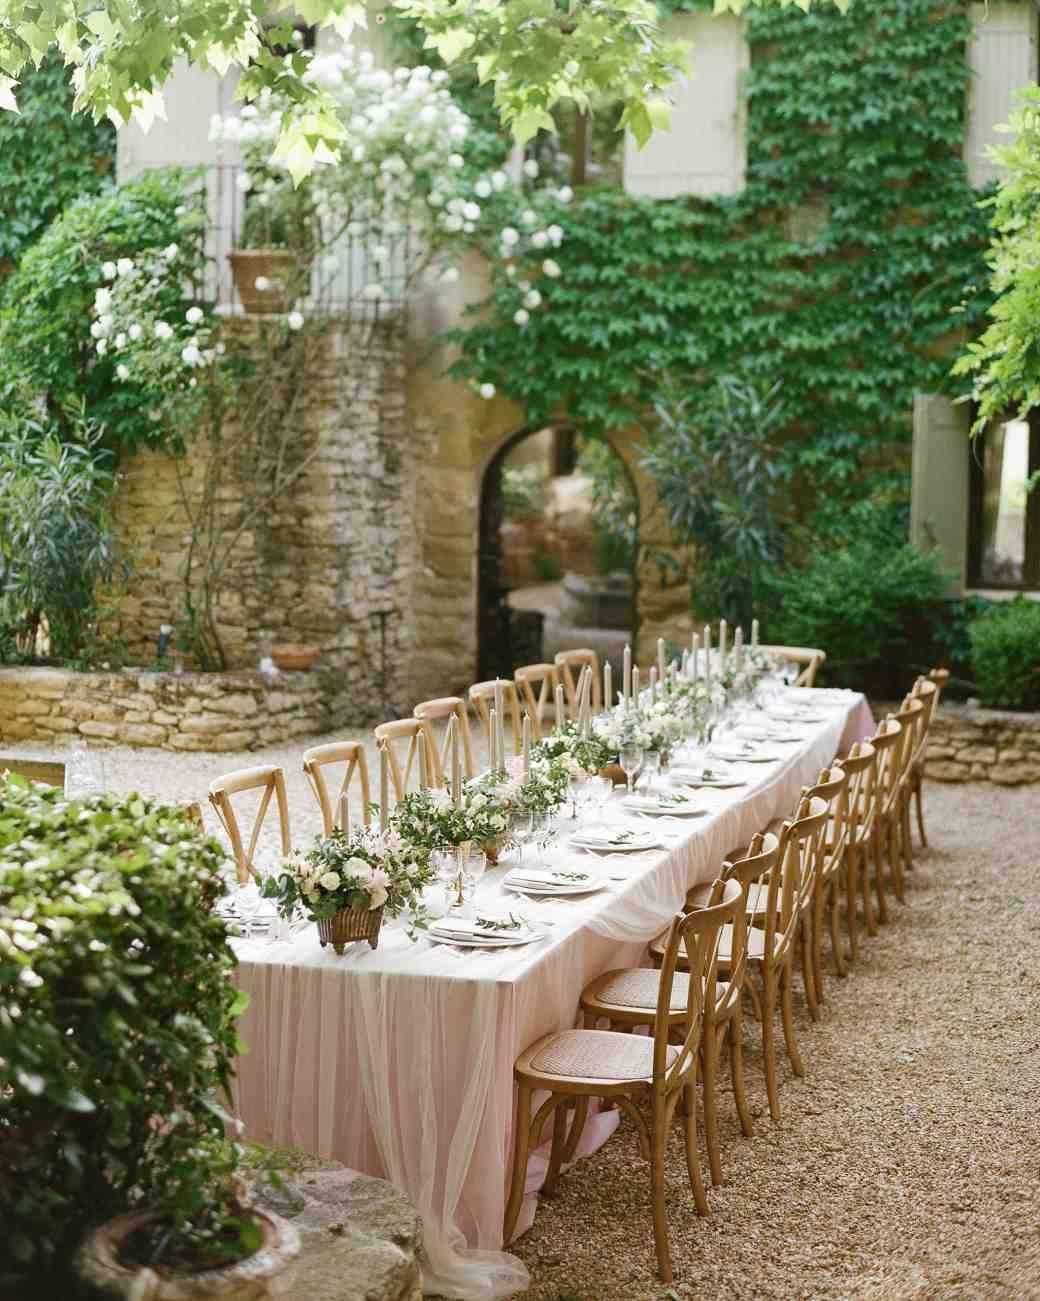 an elegant garden wedding in southern france garden wedding pinterest ideen f r die. Black Bedroom Furniture Sets. Home Design Ideas